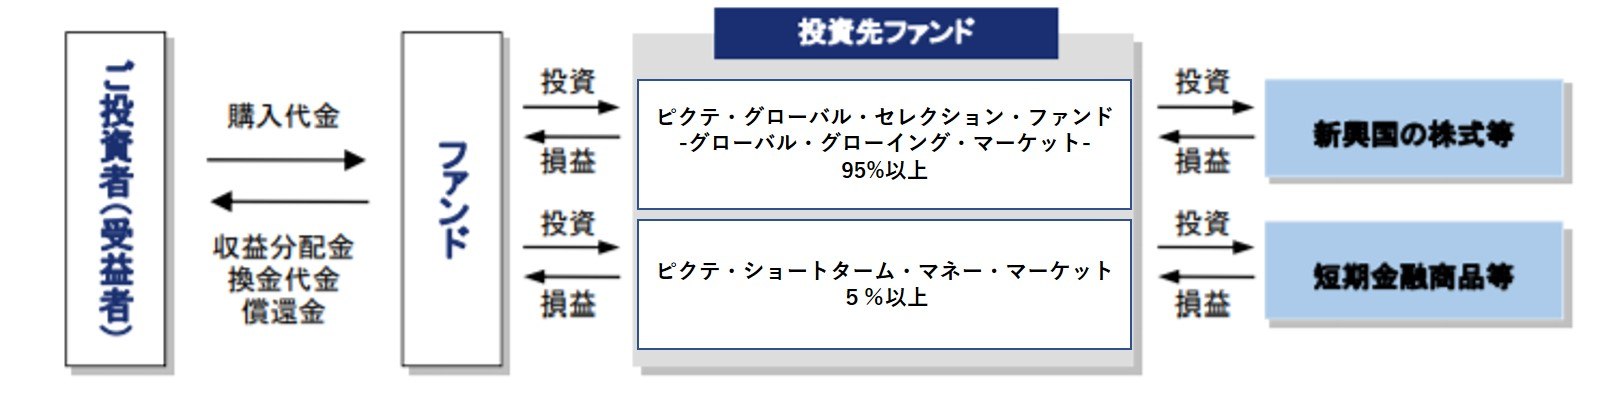 iTrust新興国株式のFund of Funds